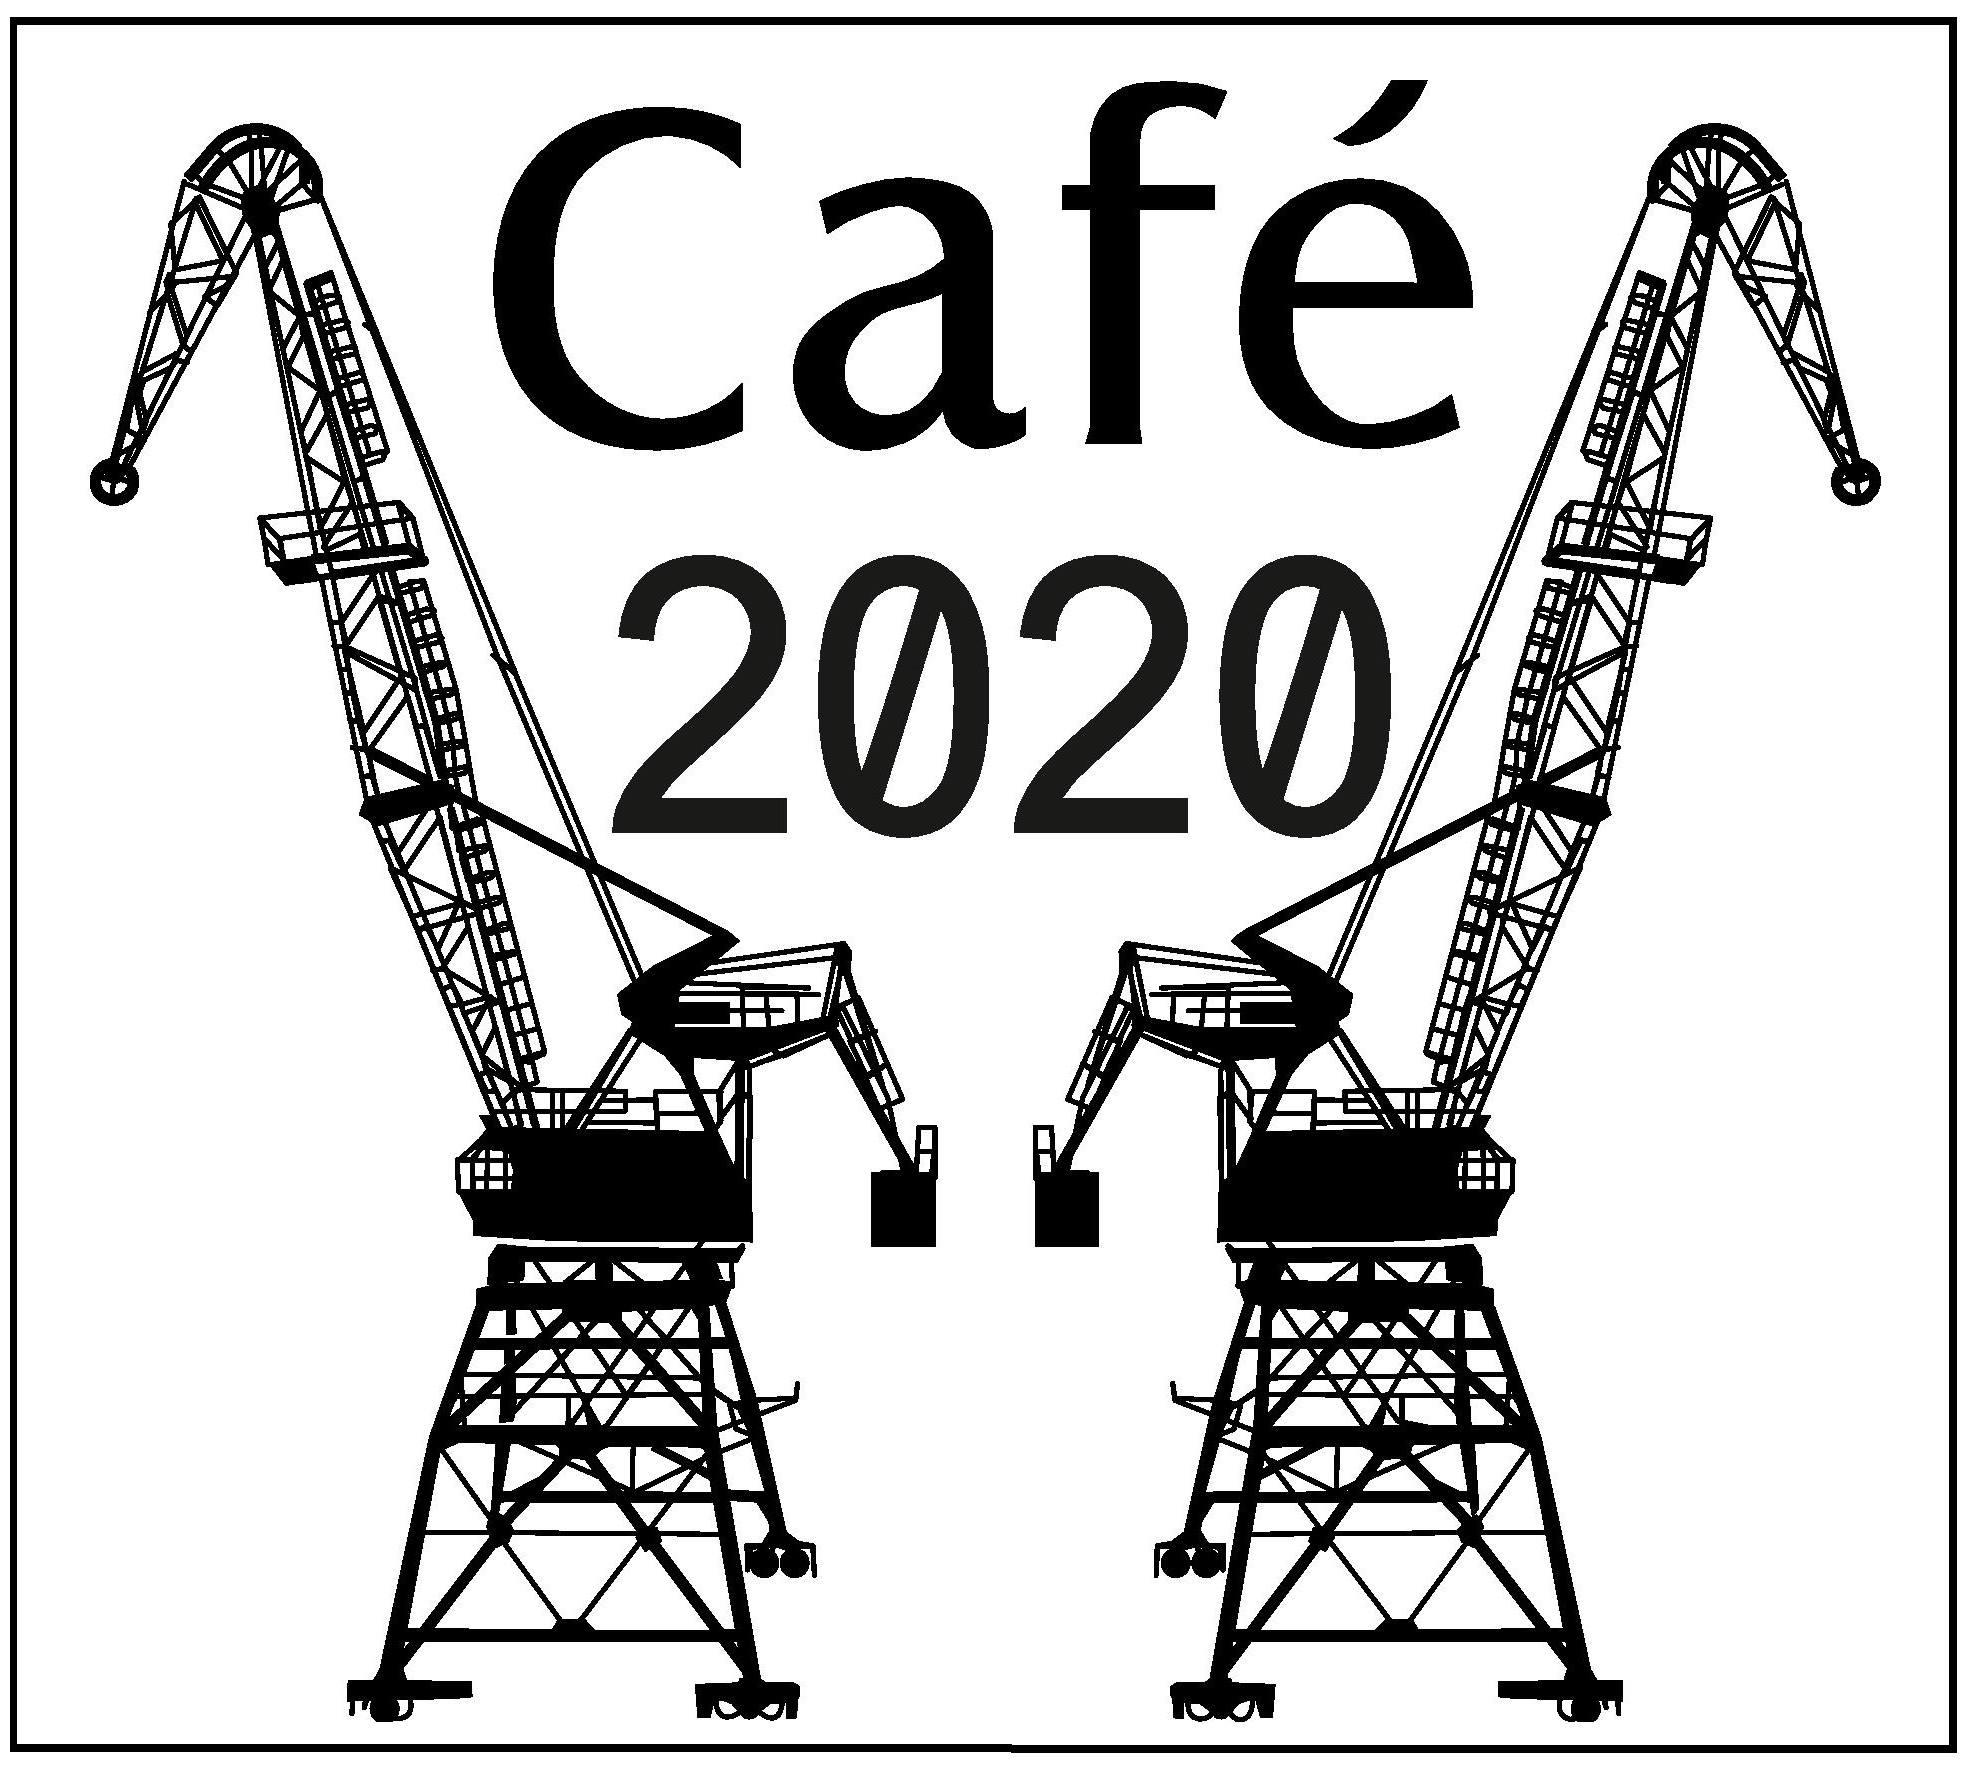 Cafe 2020